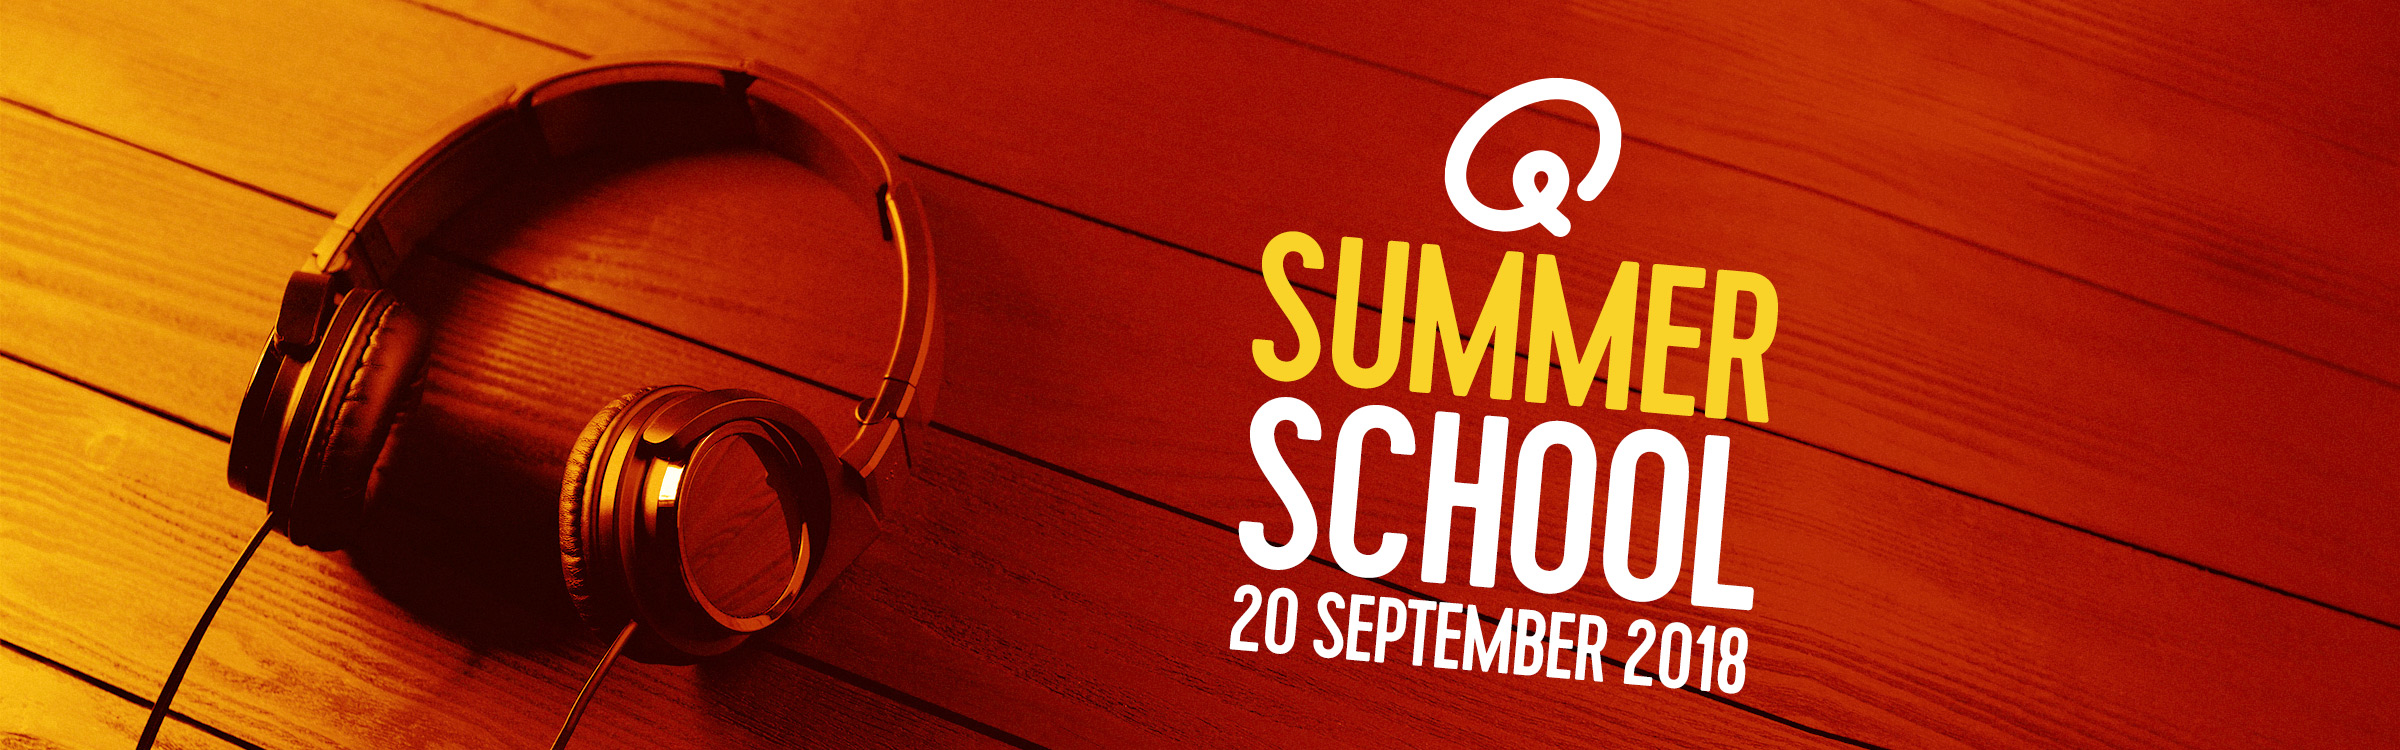 Qmusic actionheader summerschool